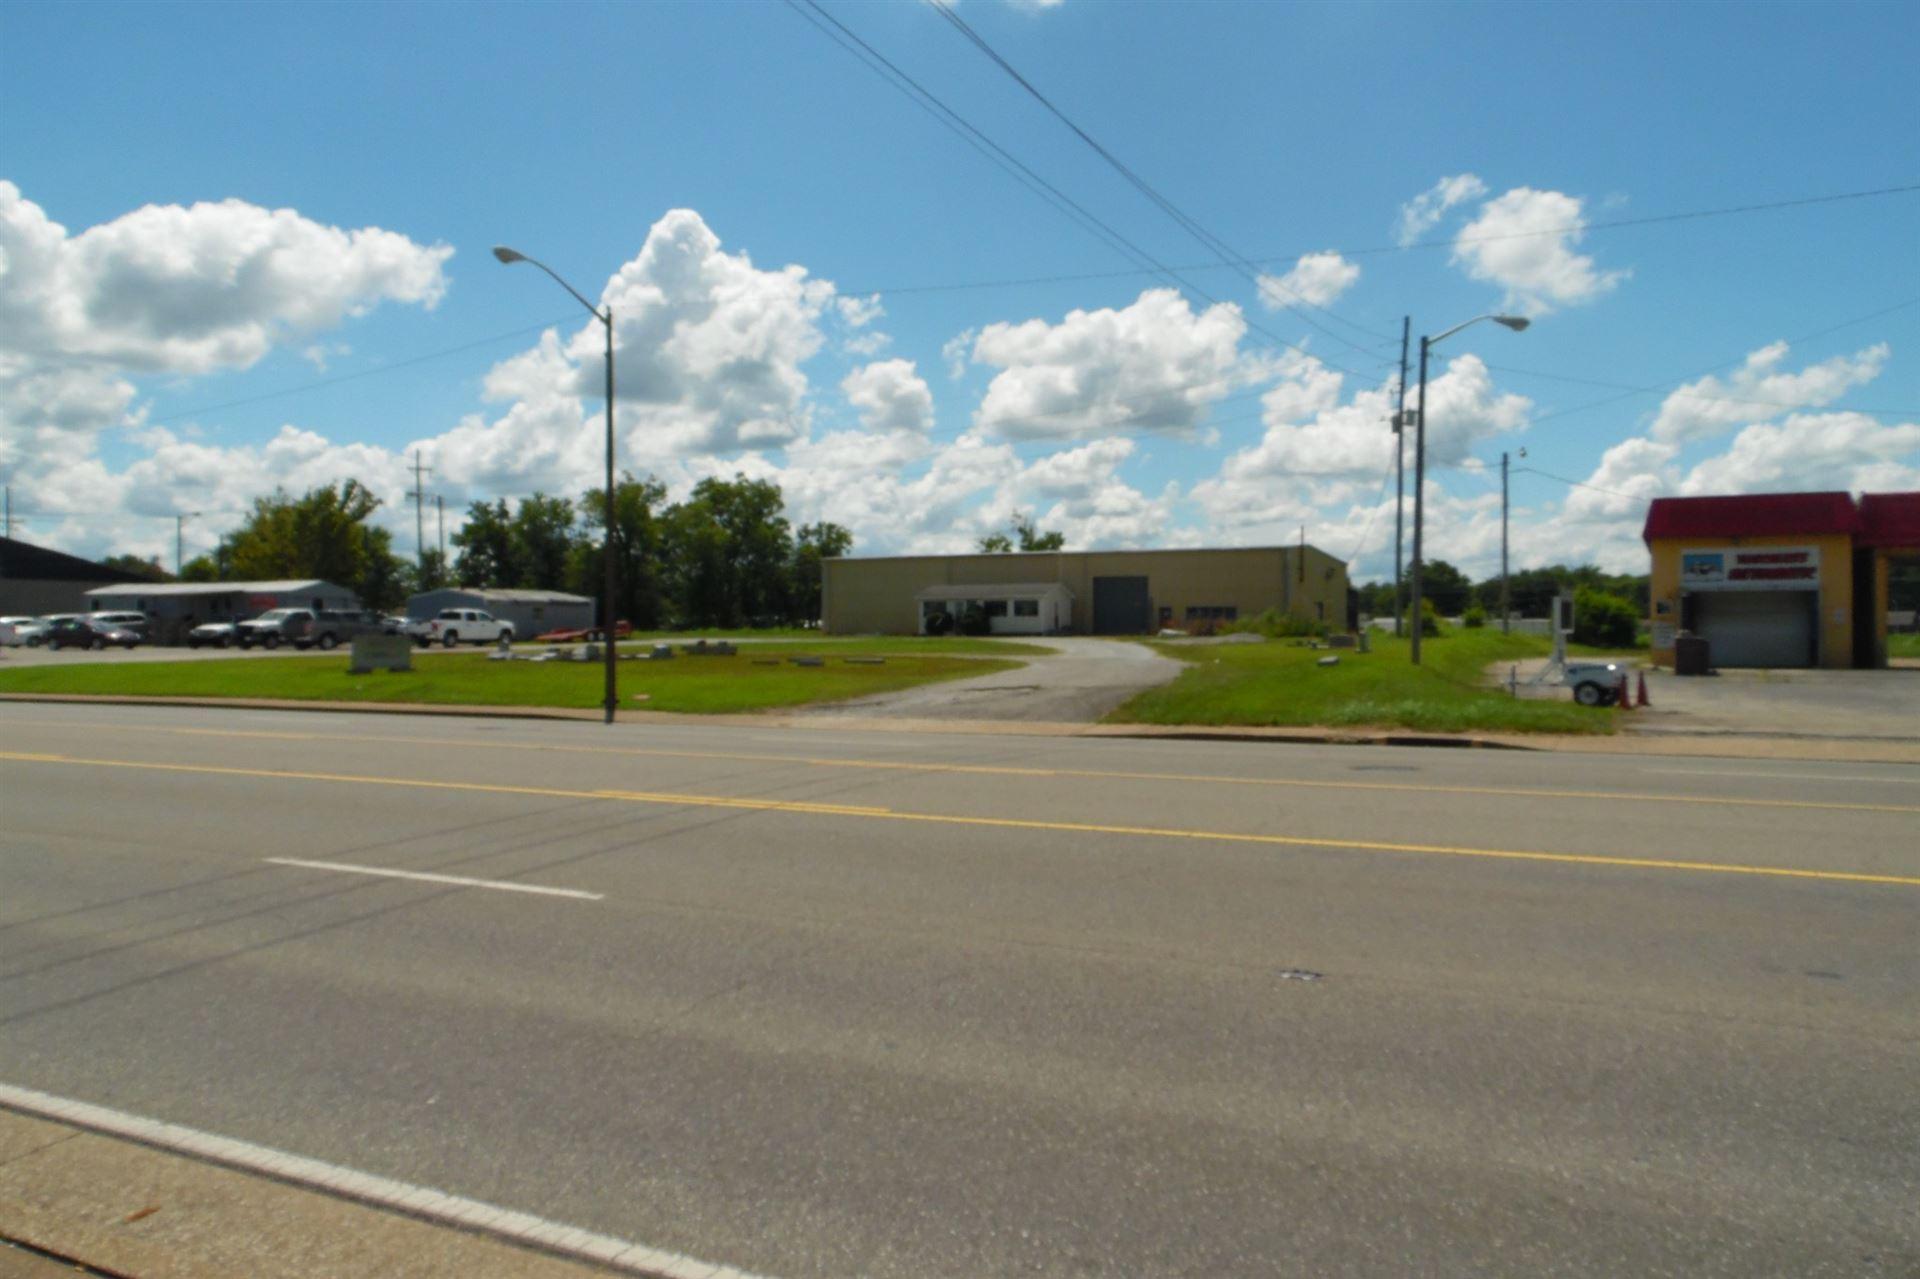 Photo of 1117 N Locust Ave., Lawrenceburg, TN 38464 (MLS # 2175126)